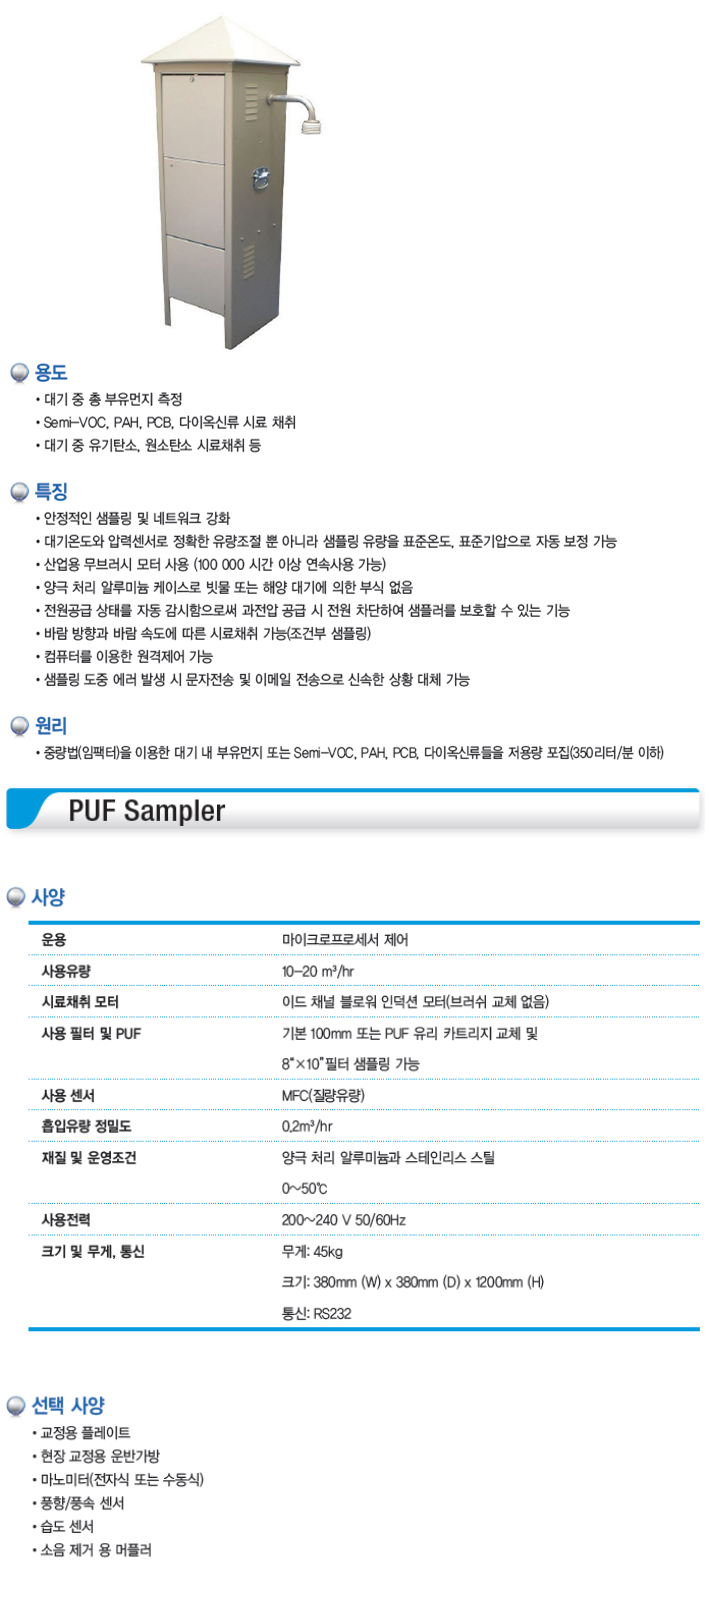 KNJ High-Vol air sampler  1